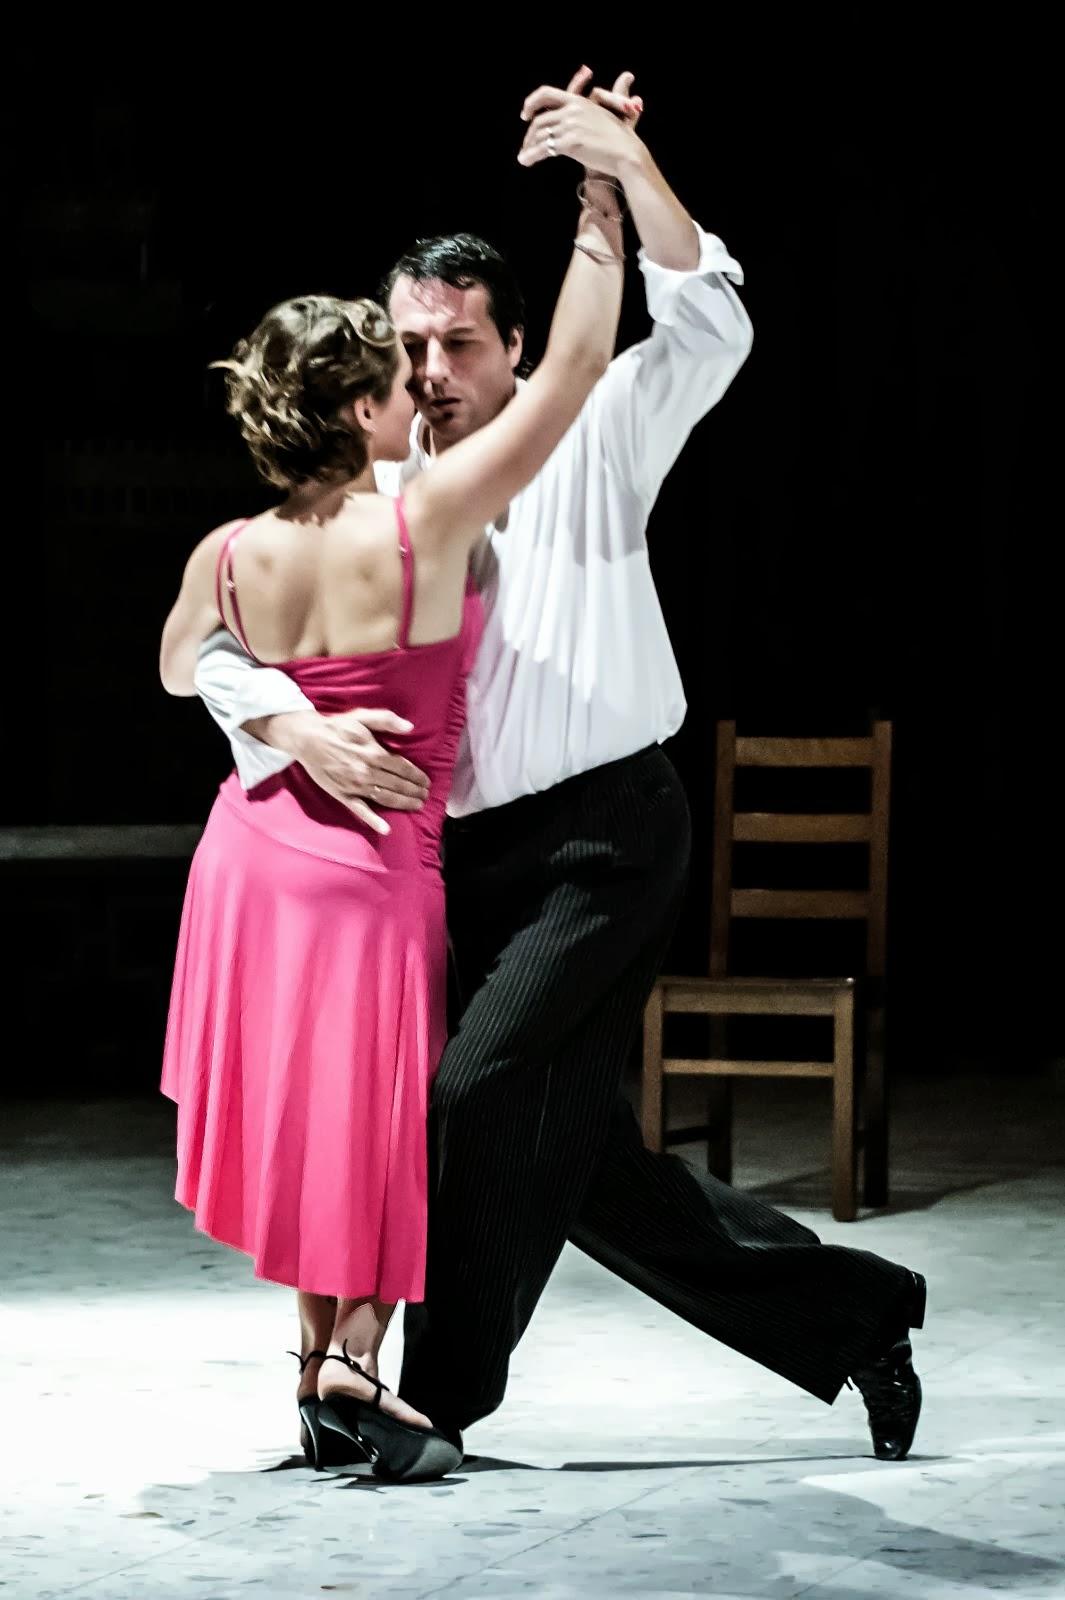 Jose and Anna